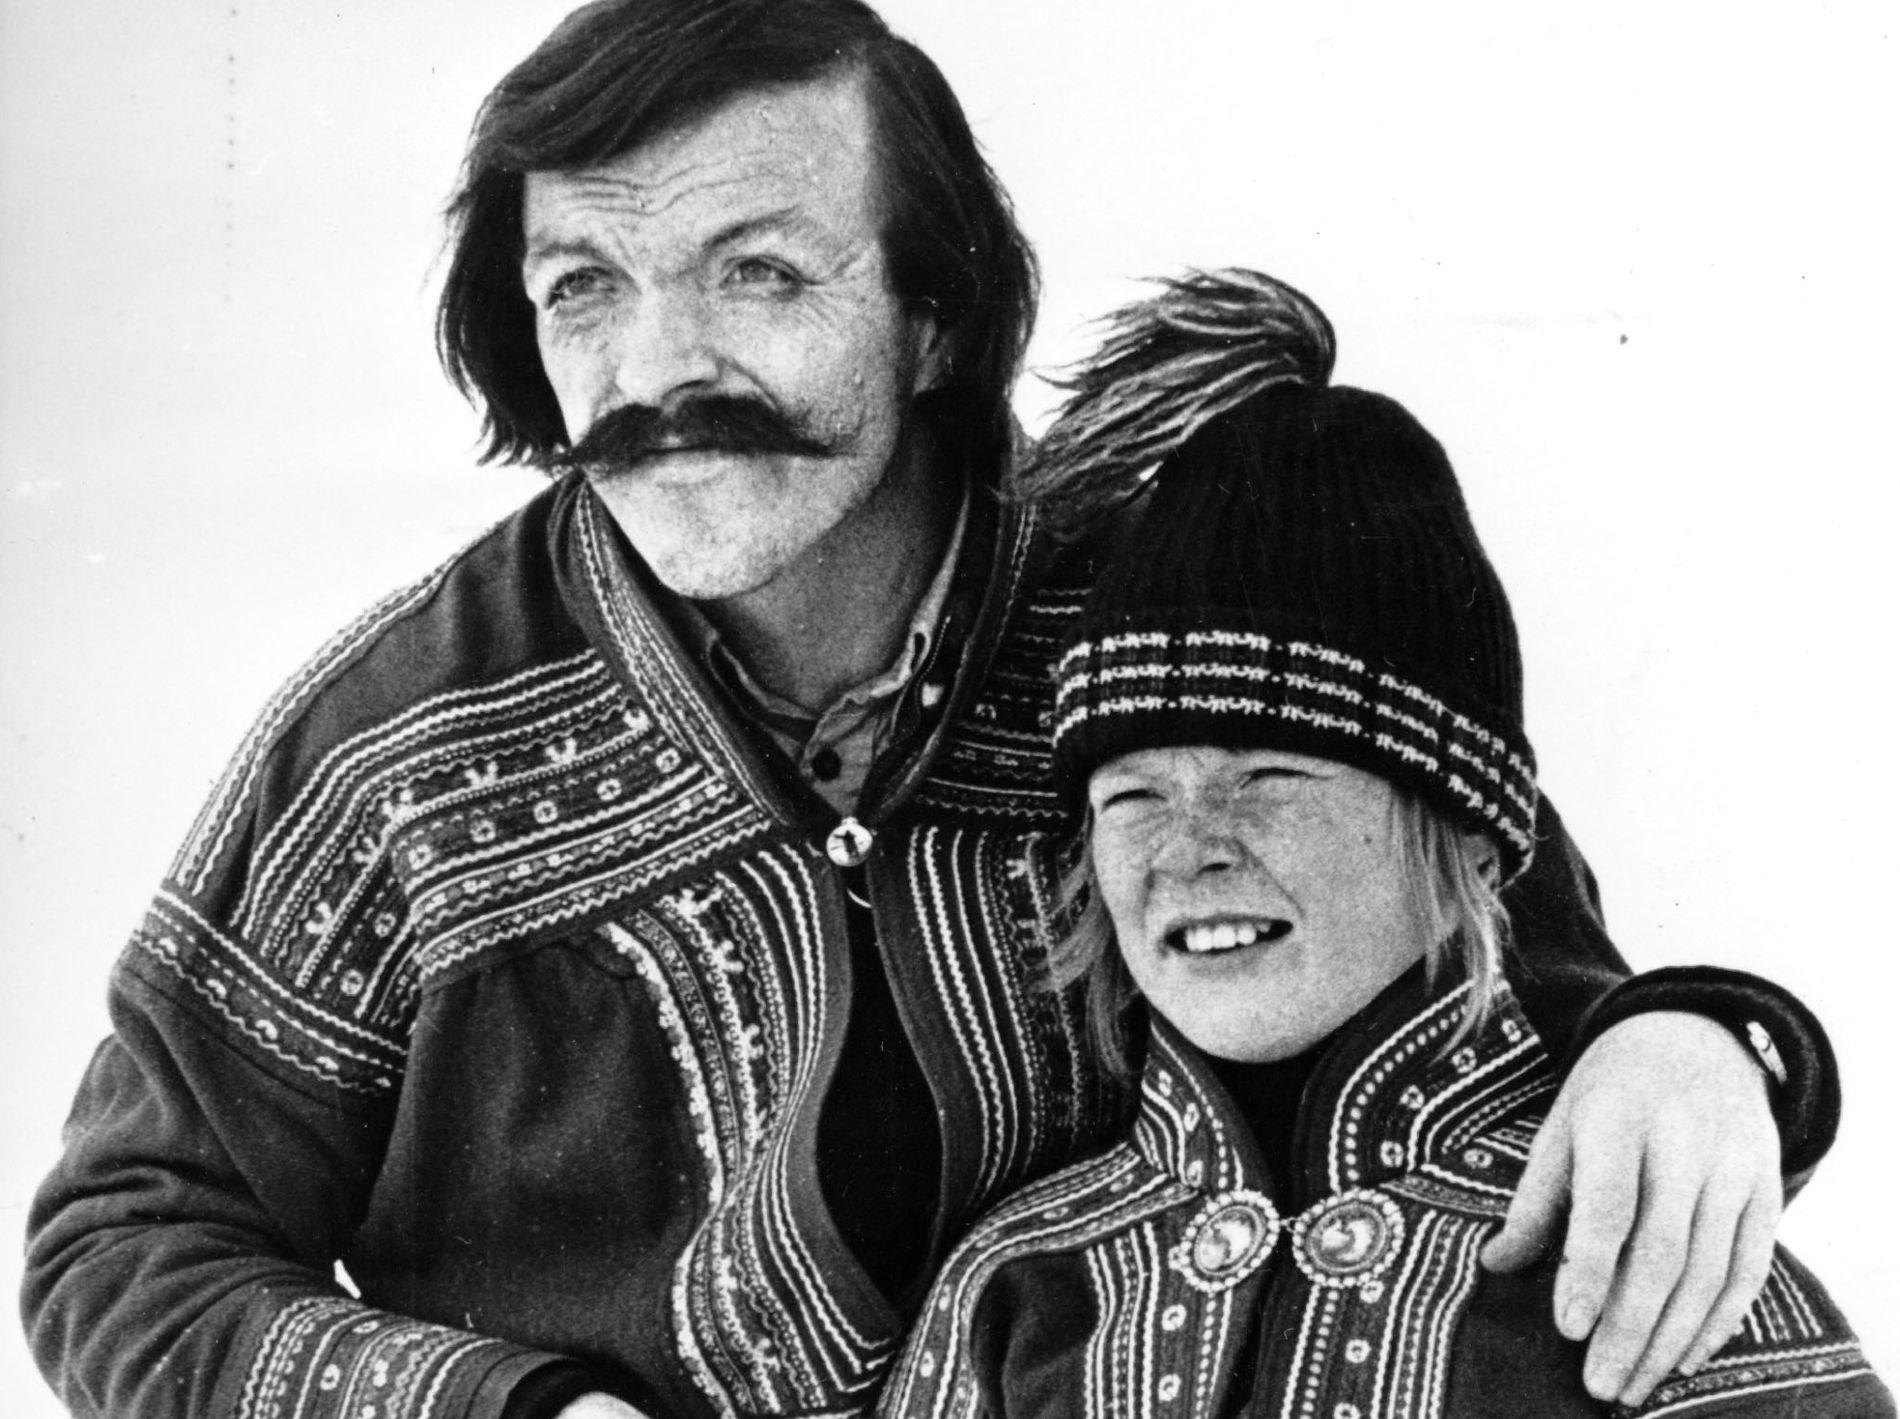 Father and son: Nils Reidar Utsi and Sverre Porsanger from the TV series